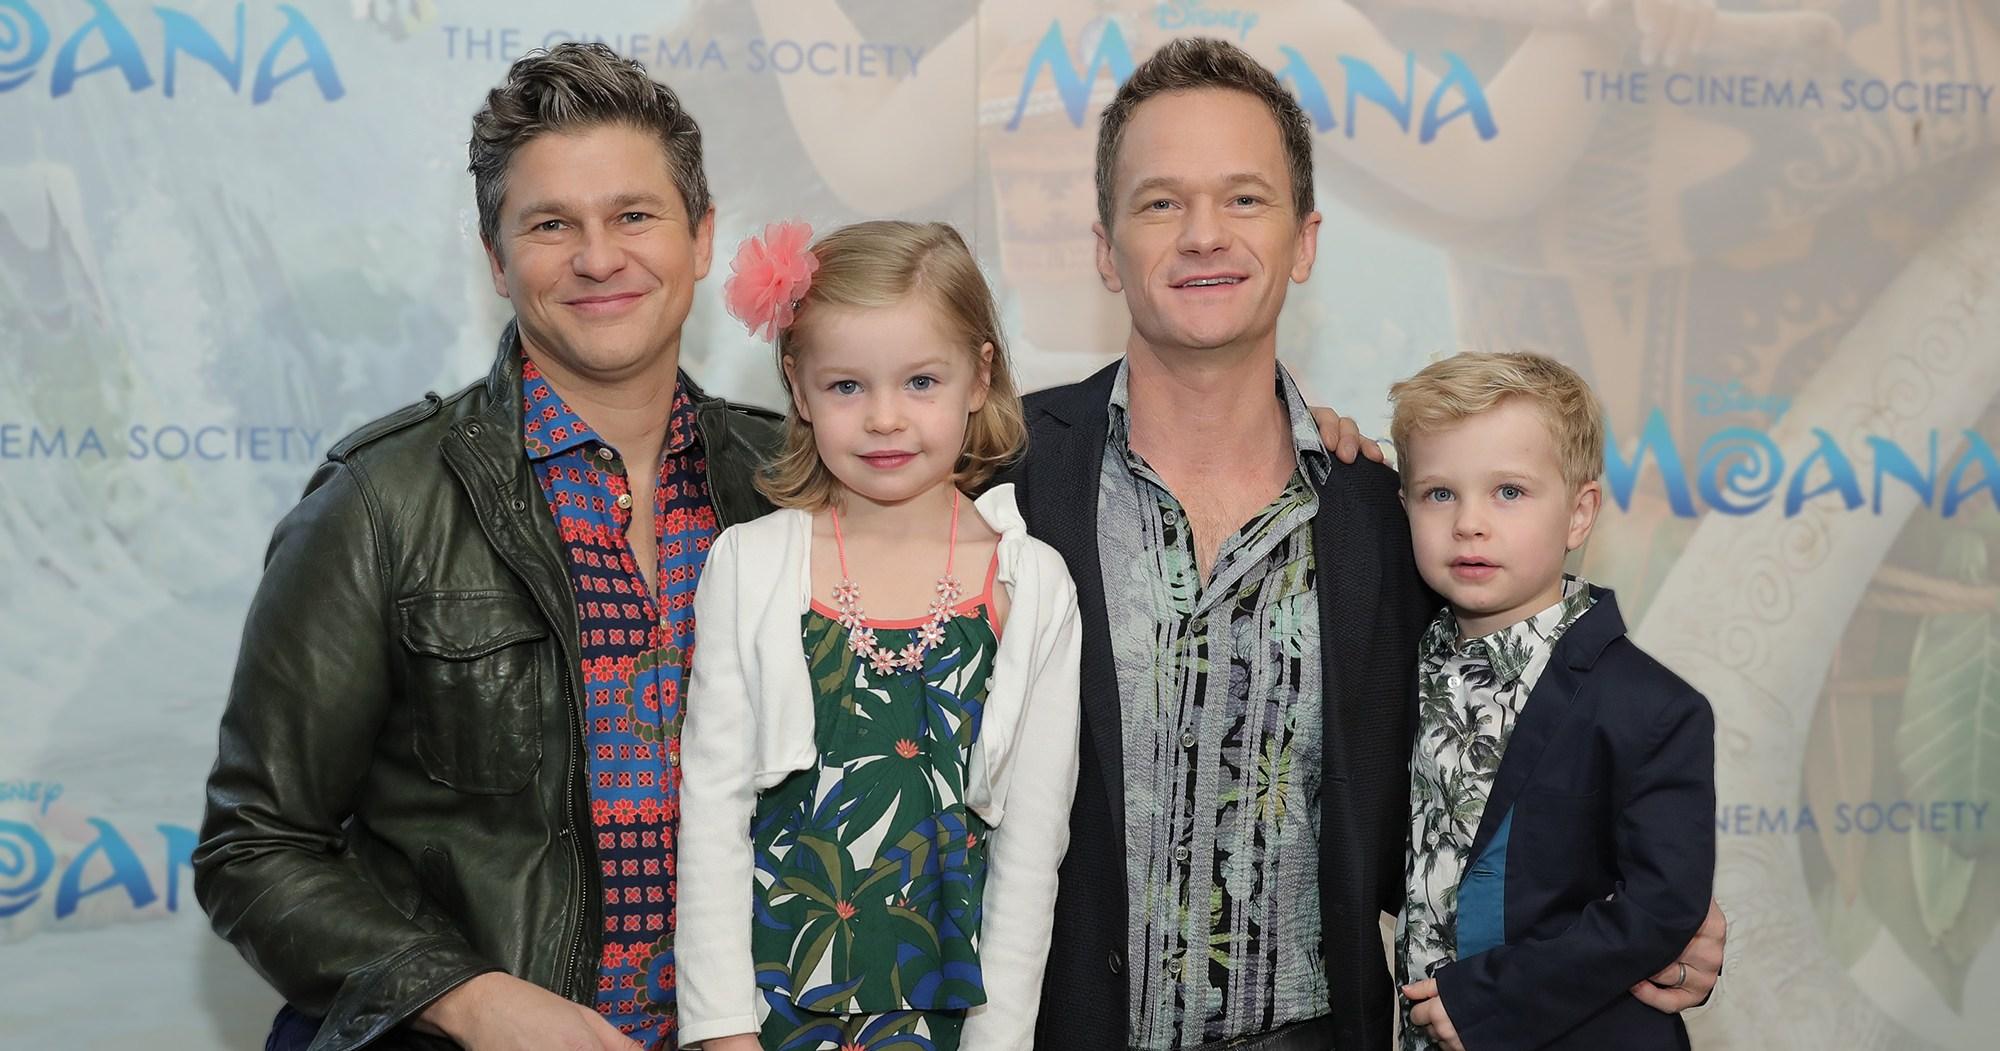 Neil Patrick Harris, David Burtka's Twins Don't Want Siblings